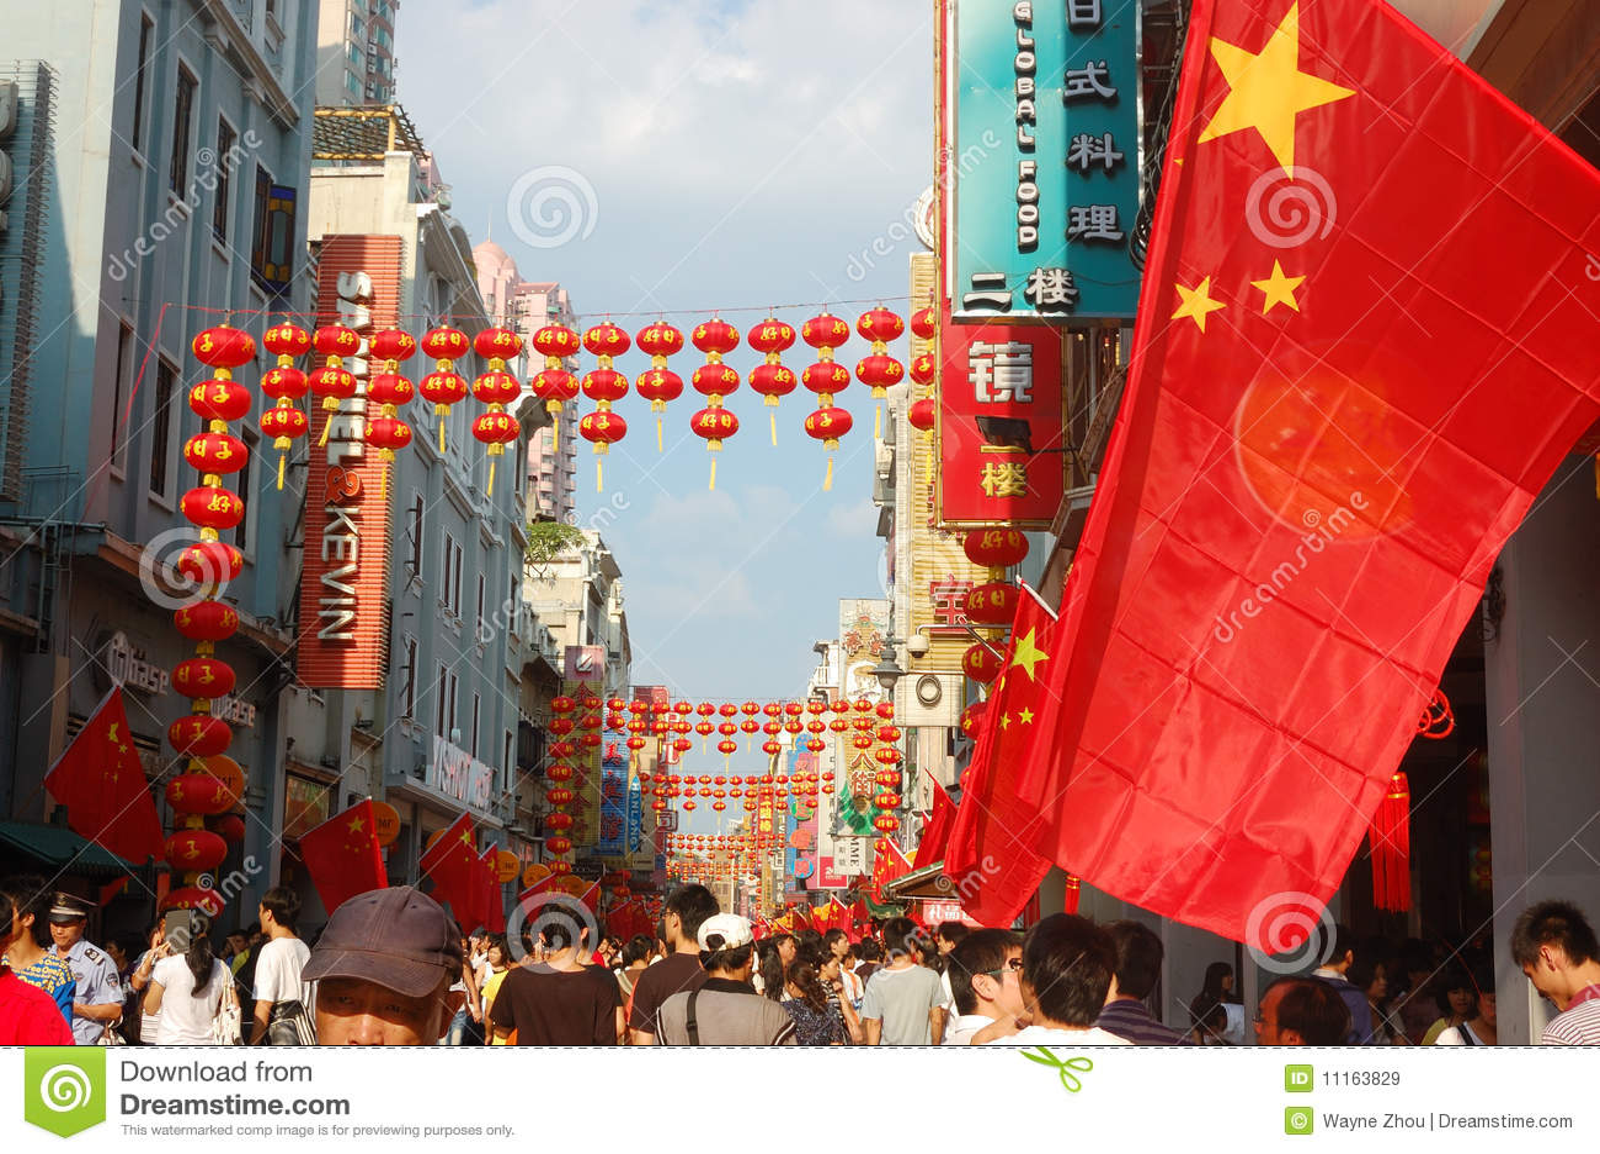 China S National Day Celebration Editorial Stock Image